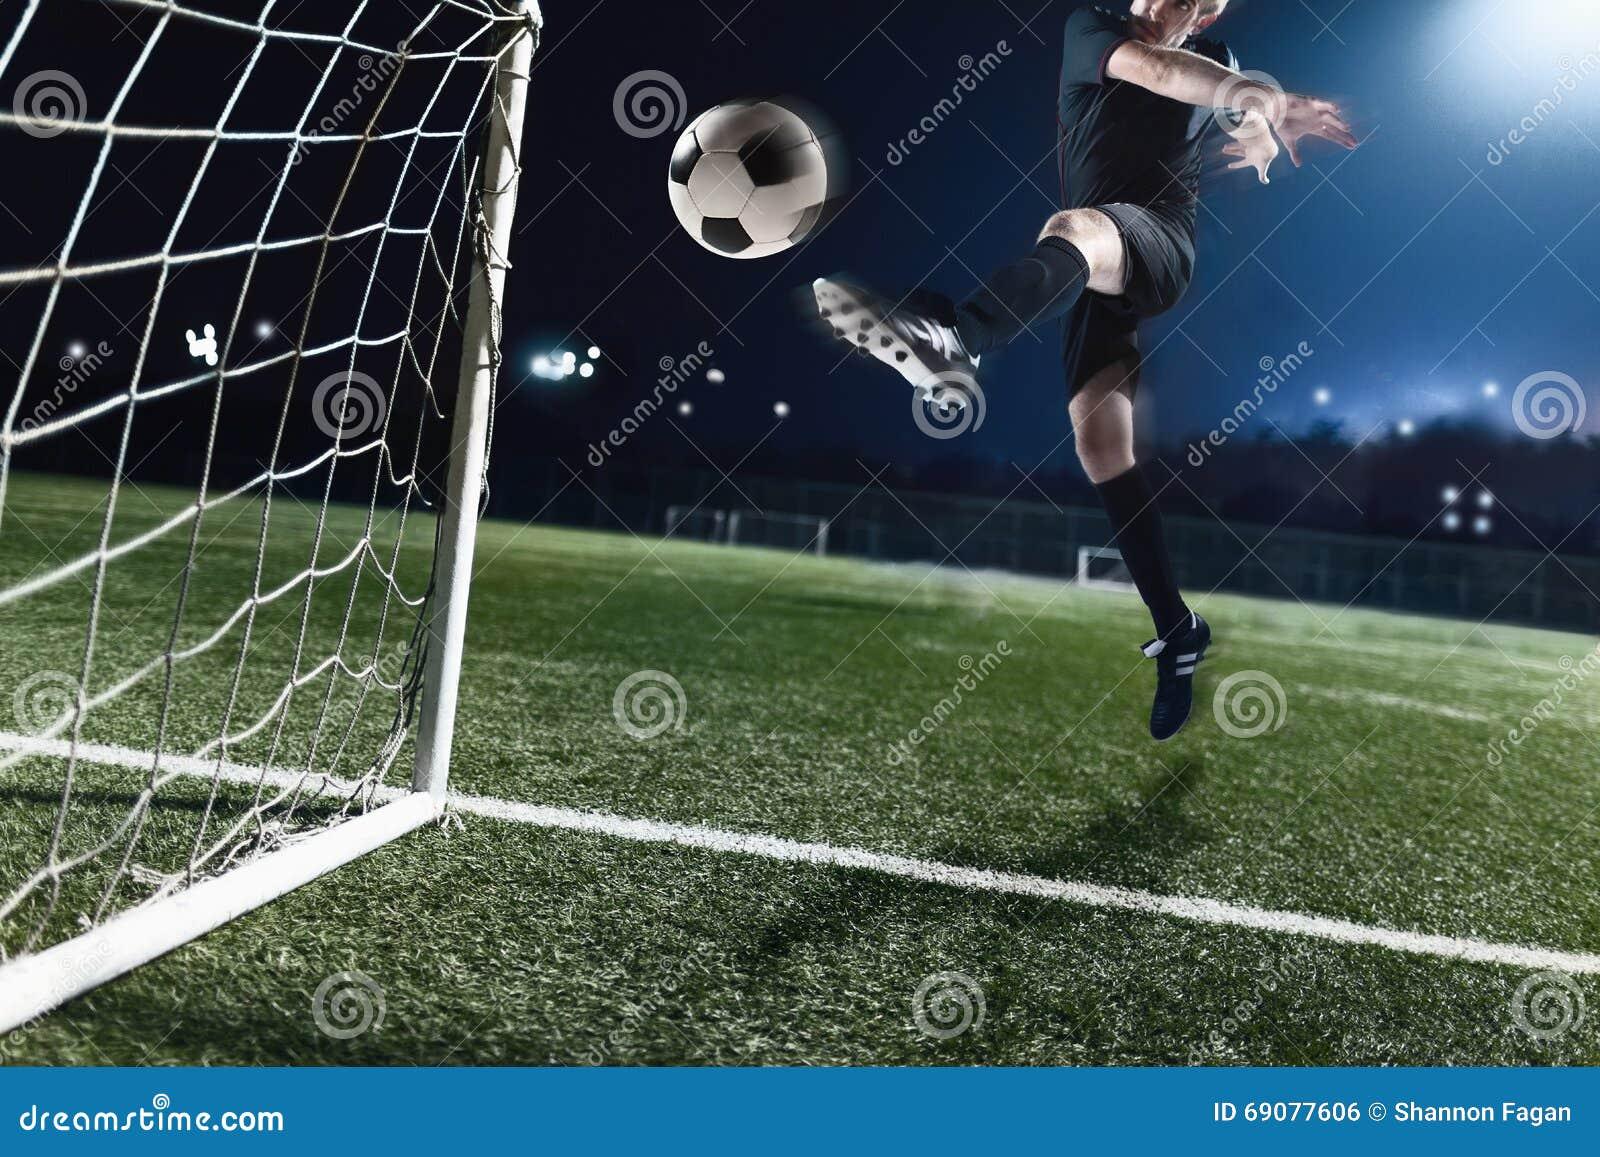 soccer ball goal cartoon vector cartoondealercom 34722701